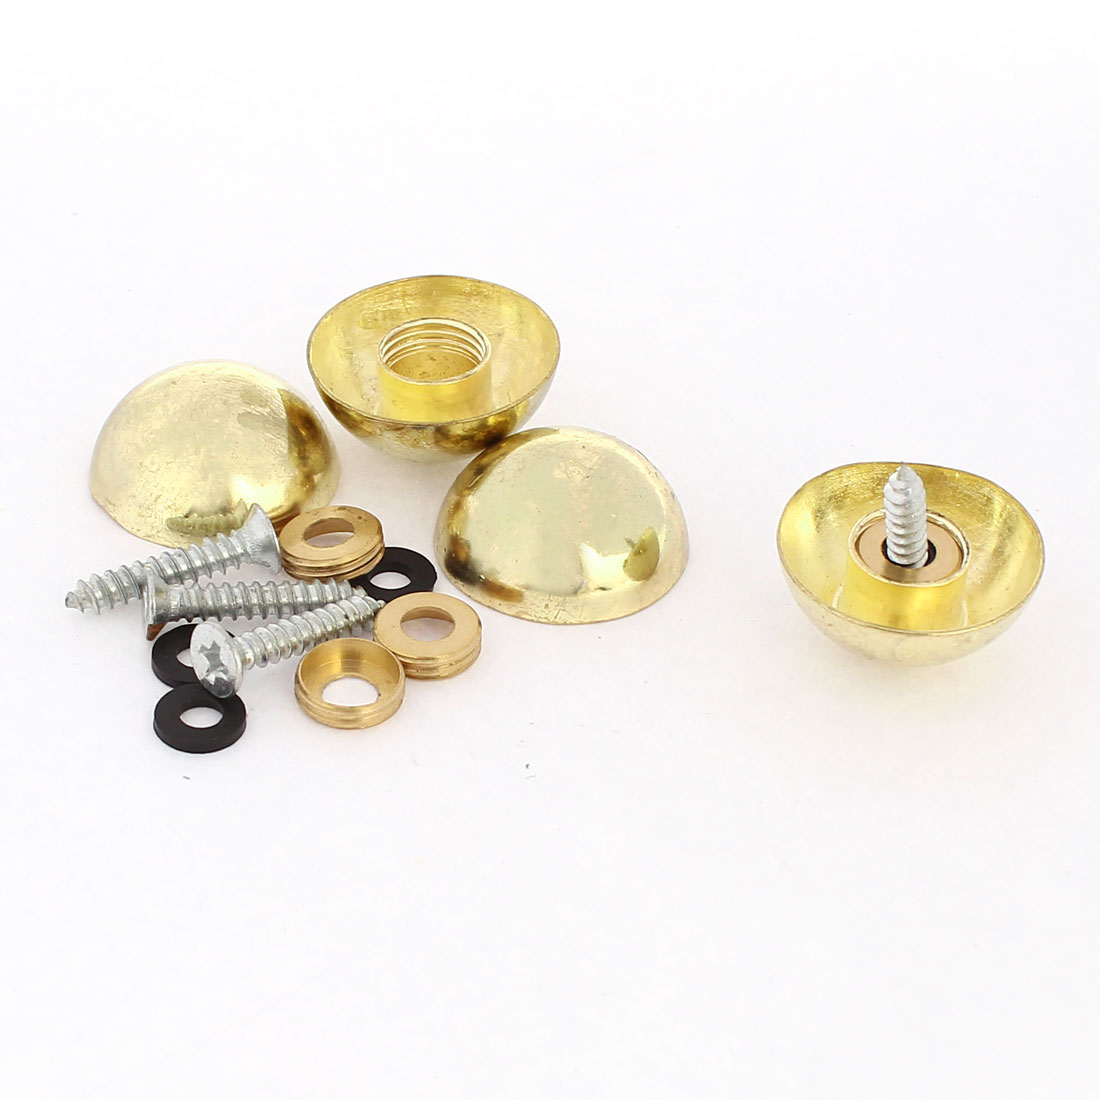 4 Pcs 23mm Dia 10mm Height Zinc Alloy Dome Glass Mirror Screw Caps Gold Tone